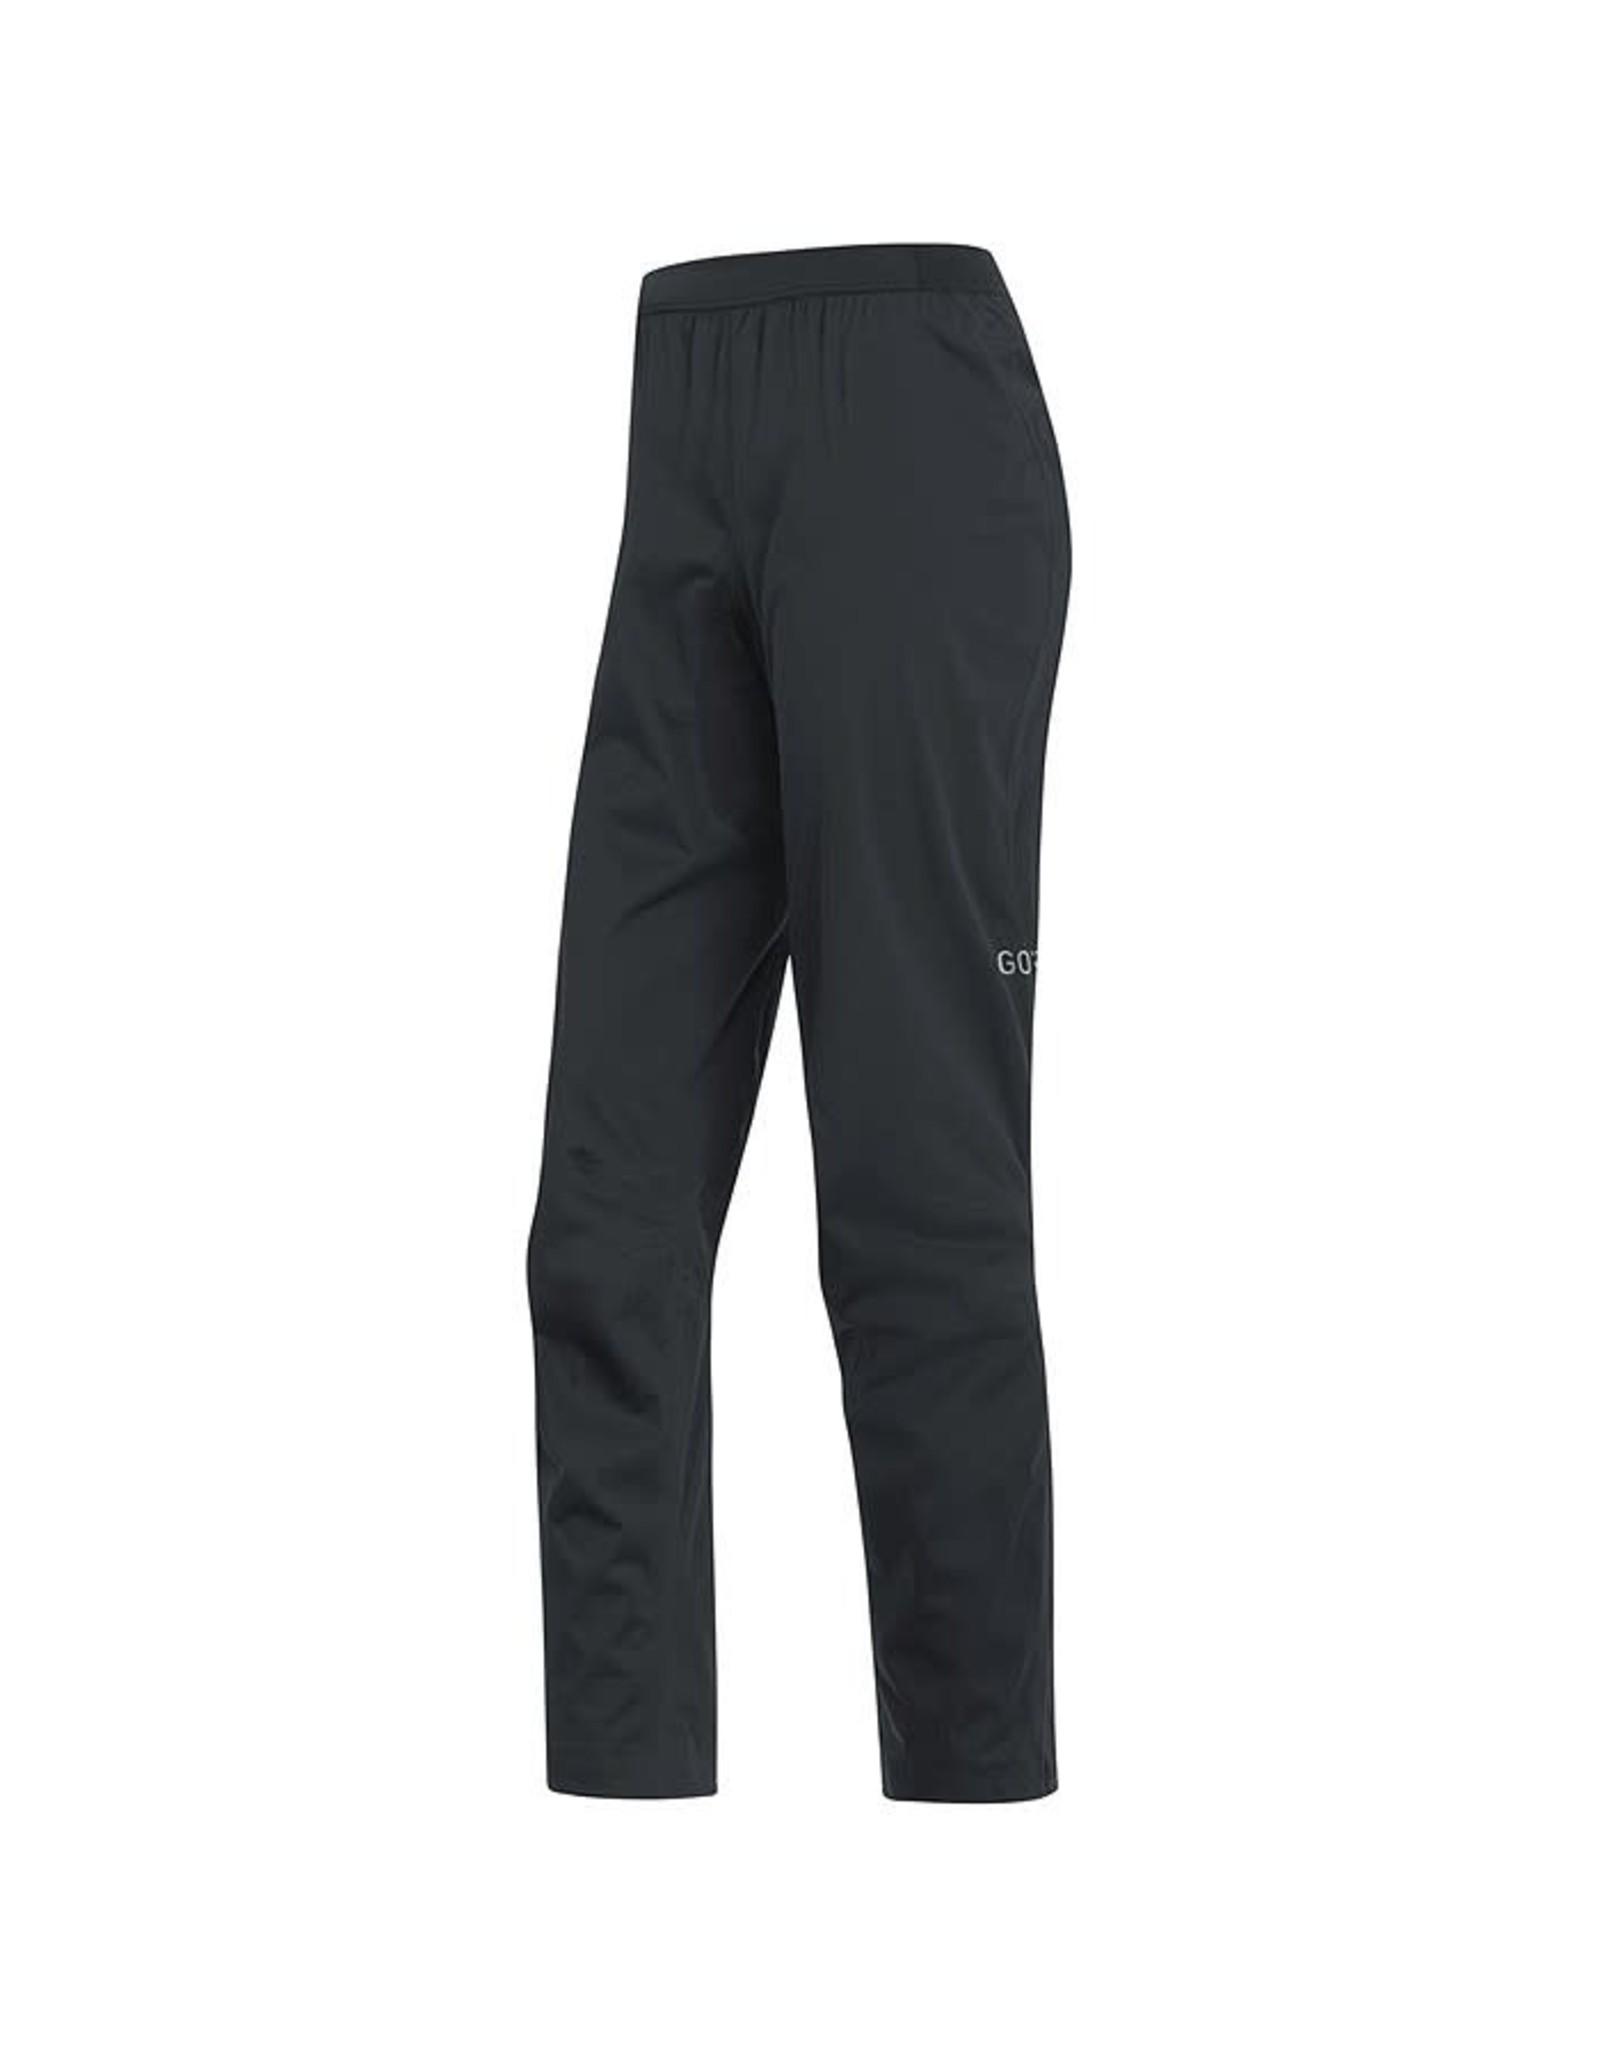 Gore Gore Element Gore-tex Active Pants